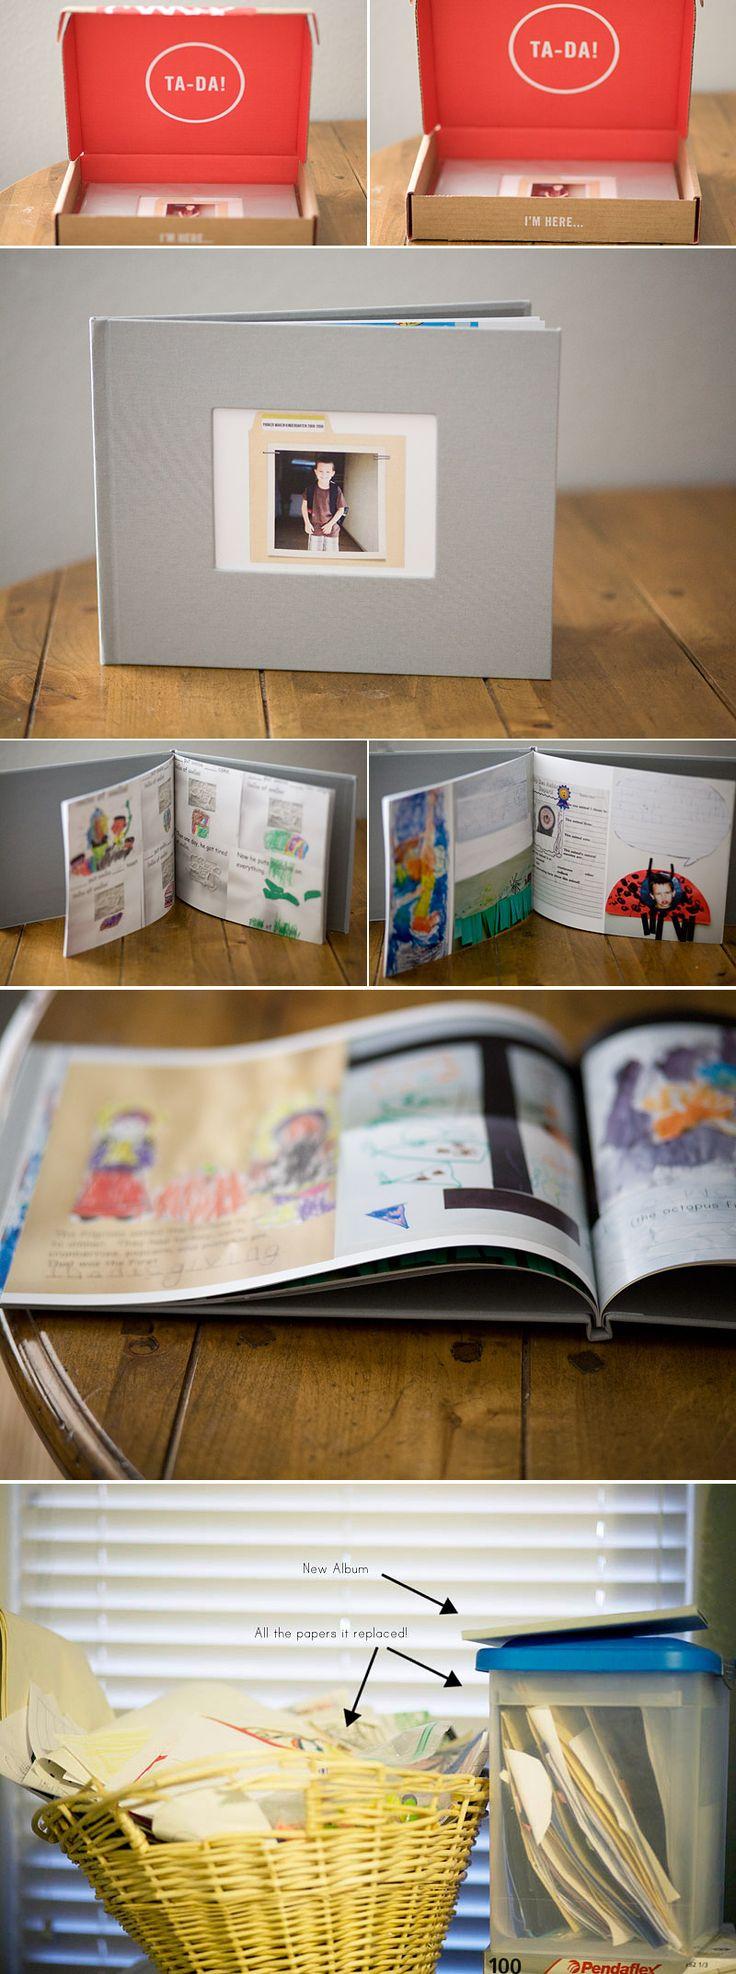 Scrapbook ideas school project - Photo Books For The Piles Of School Art Around Here Good Idea